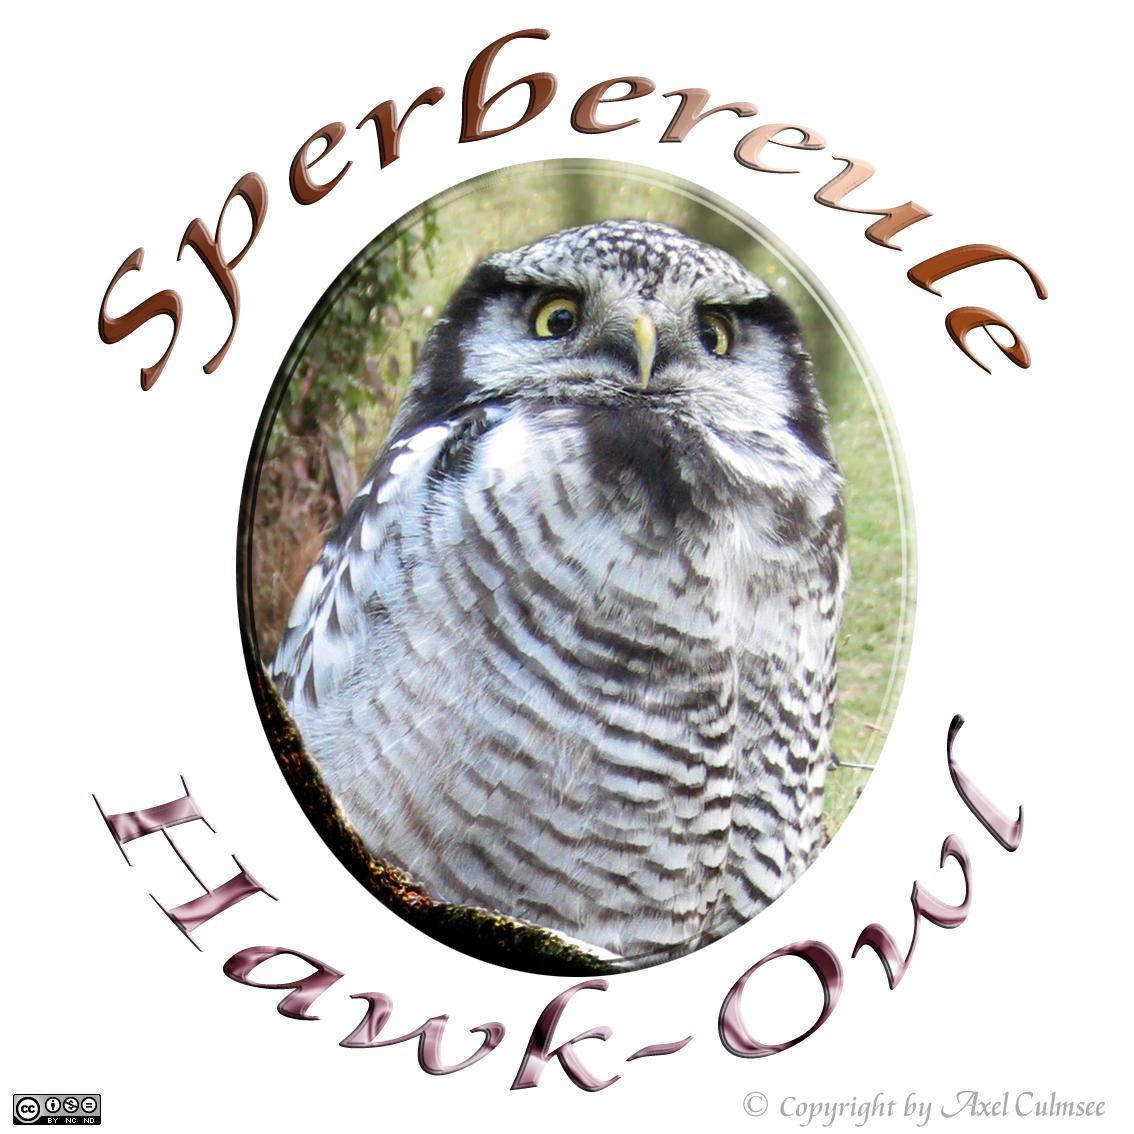 Northern hawk-owl, Sperbereule